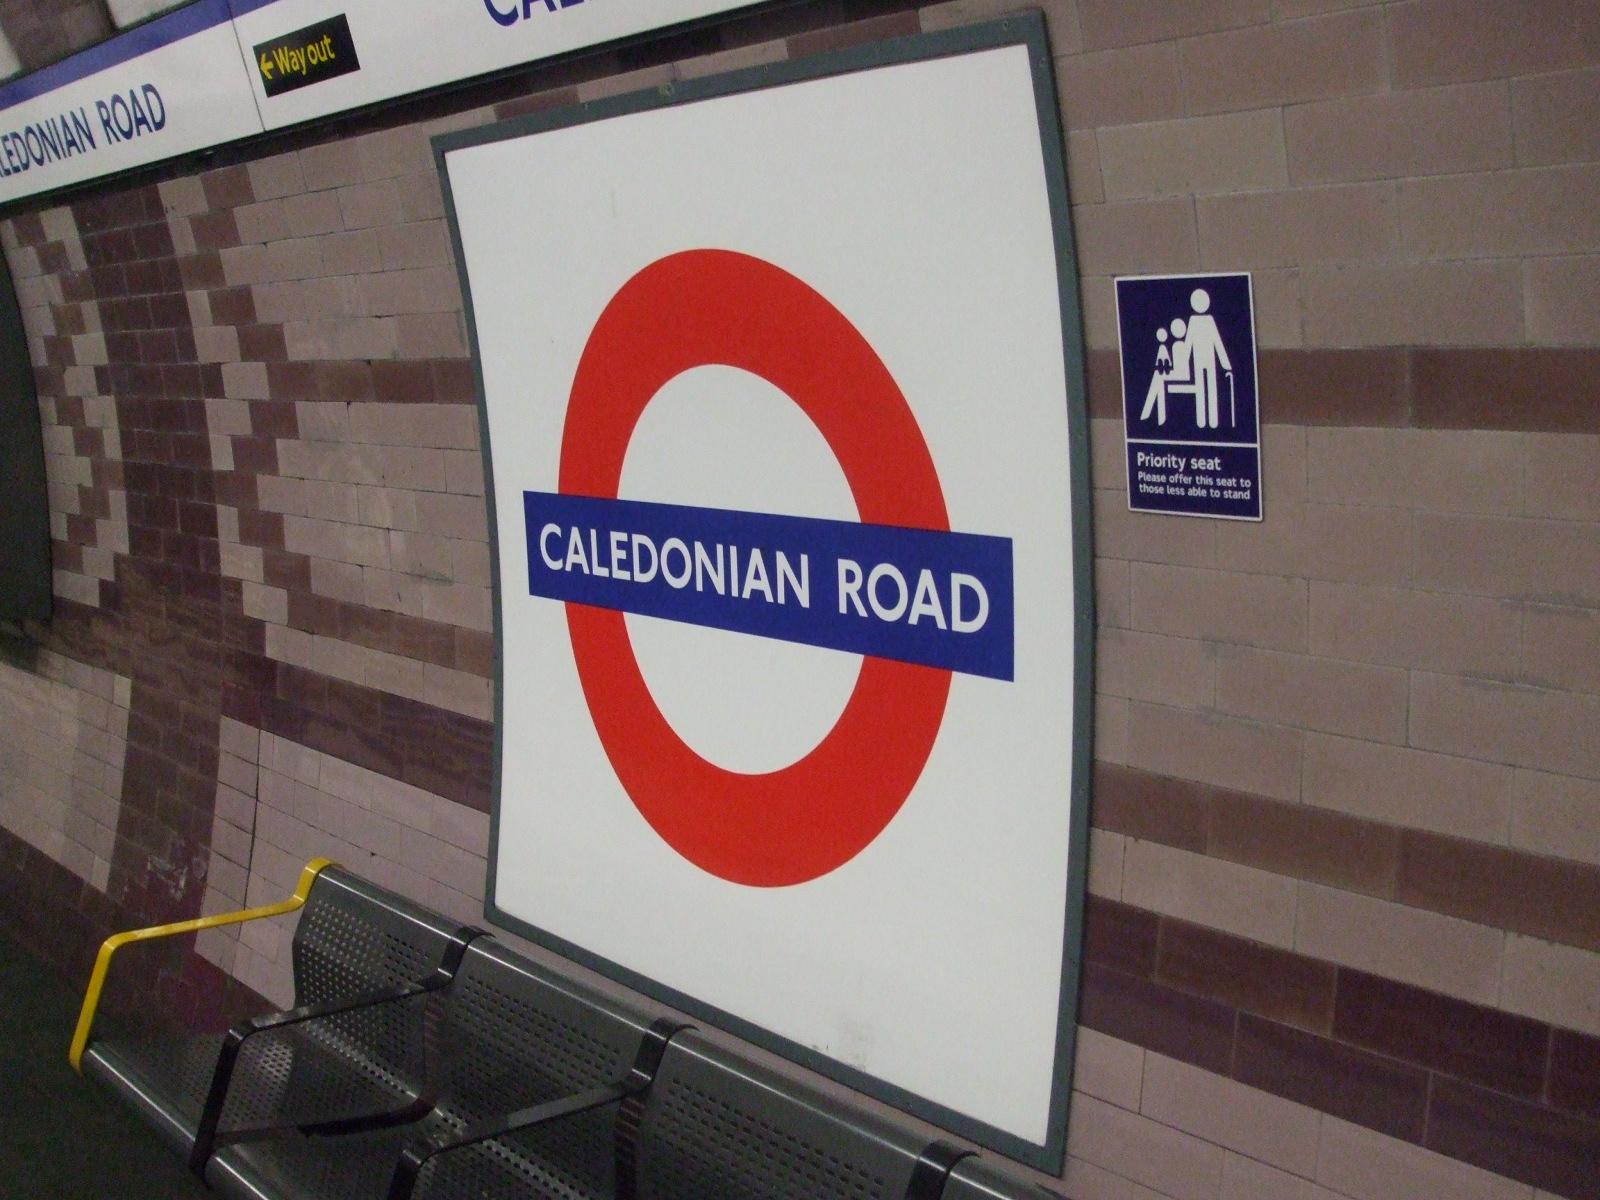 Caledonian_Road_stn_roundel.JPG